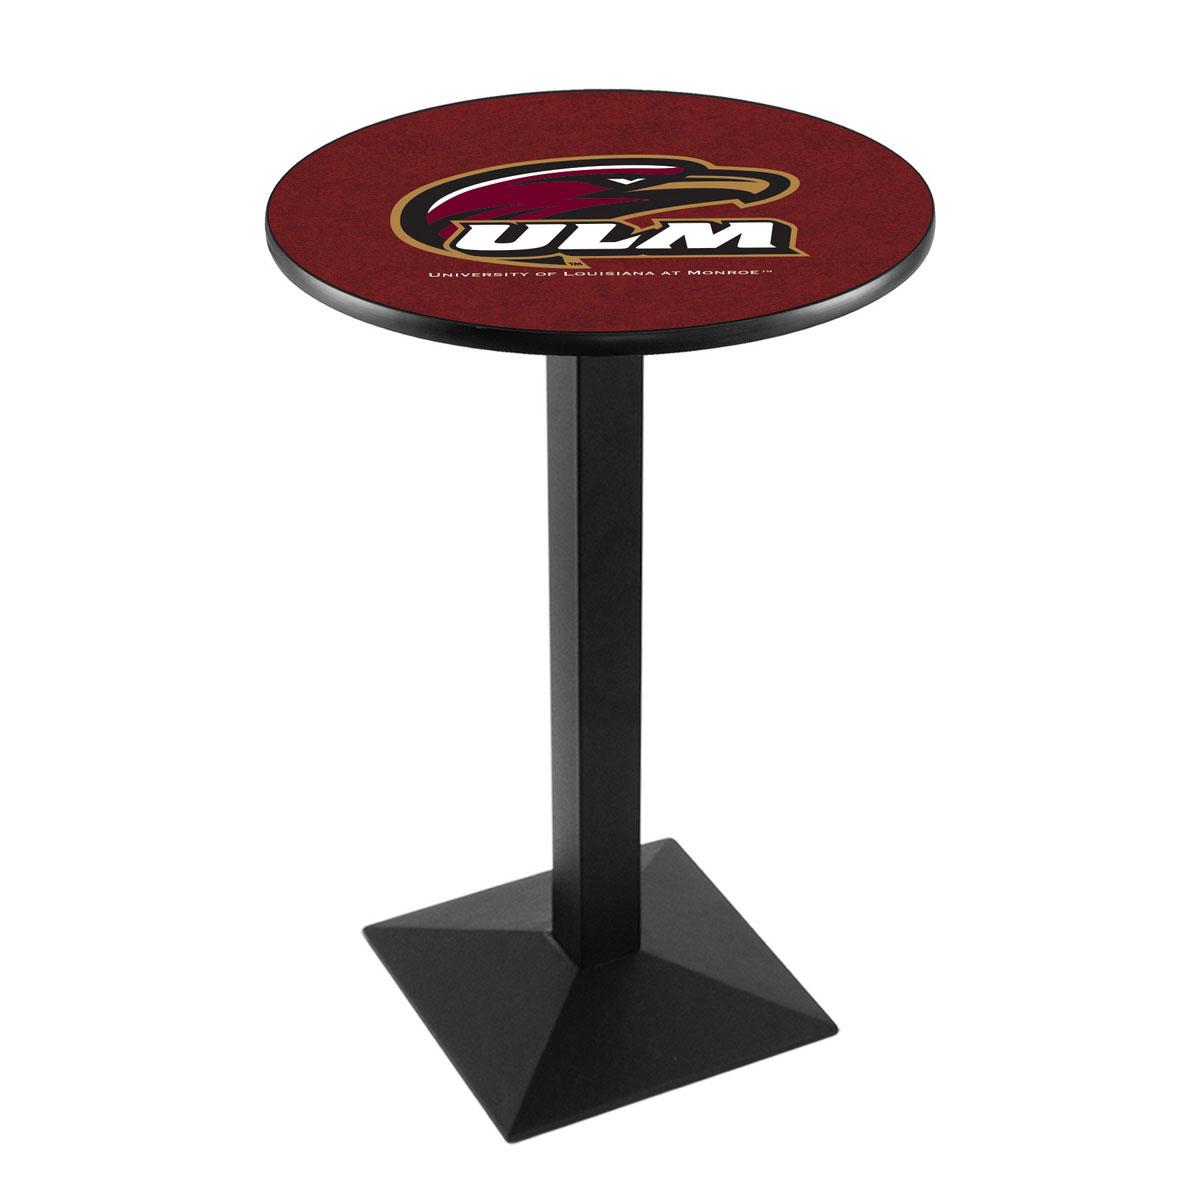 Wonderful University Louisiana At Monroe Logo Pub Bar Table Square Stand Product Photo